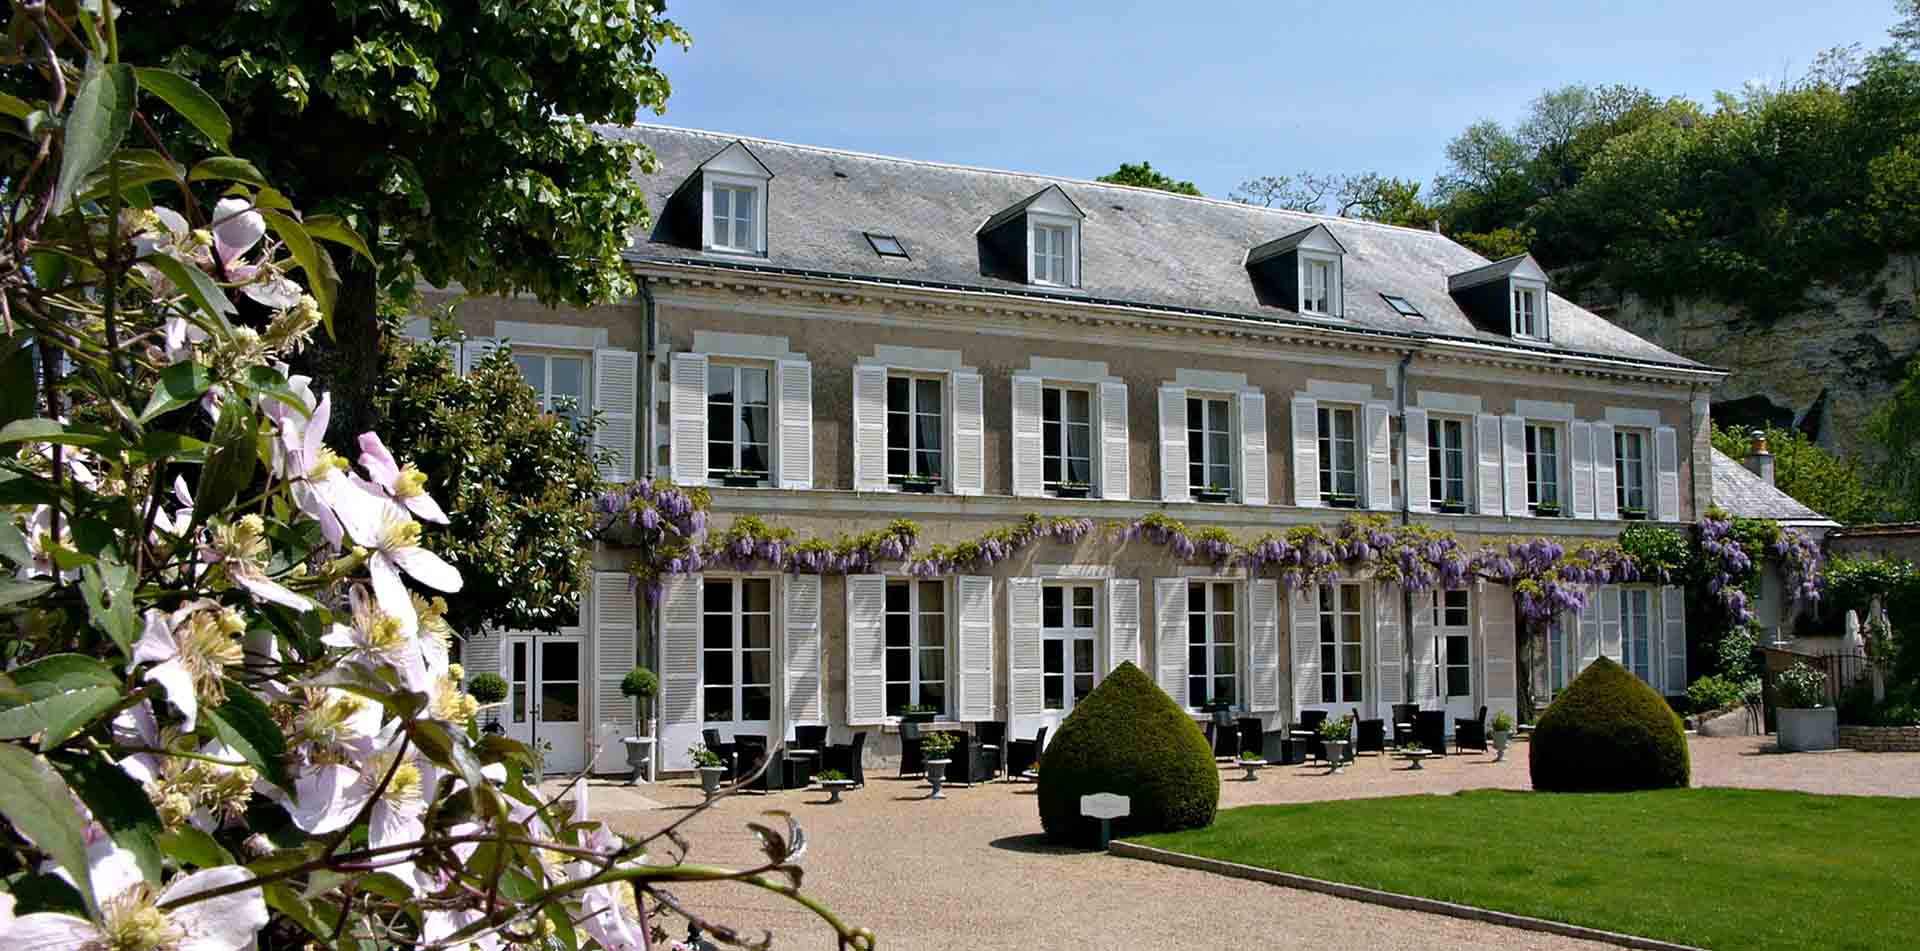 Manoir les Minimes, Loire, France